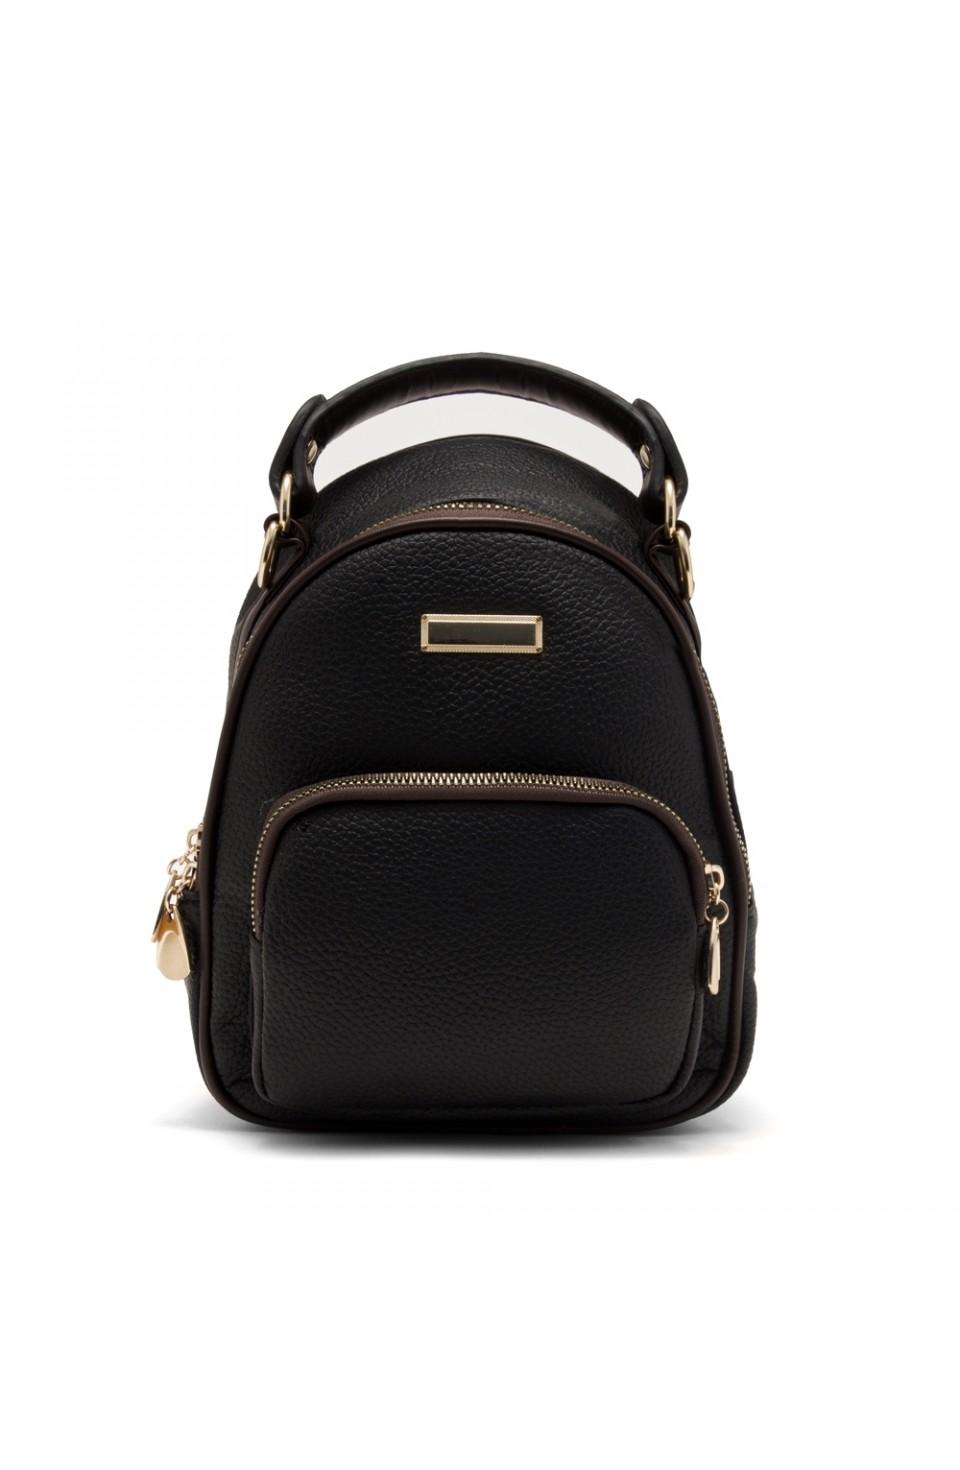 SLD-BETTY- Women's Trendy Mini Backpack (Black)